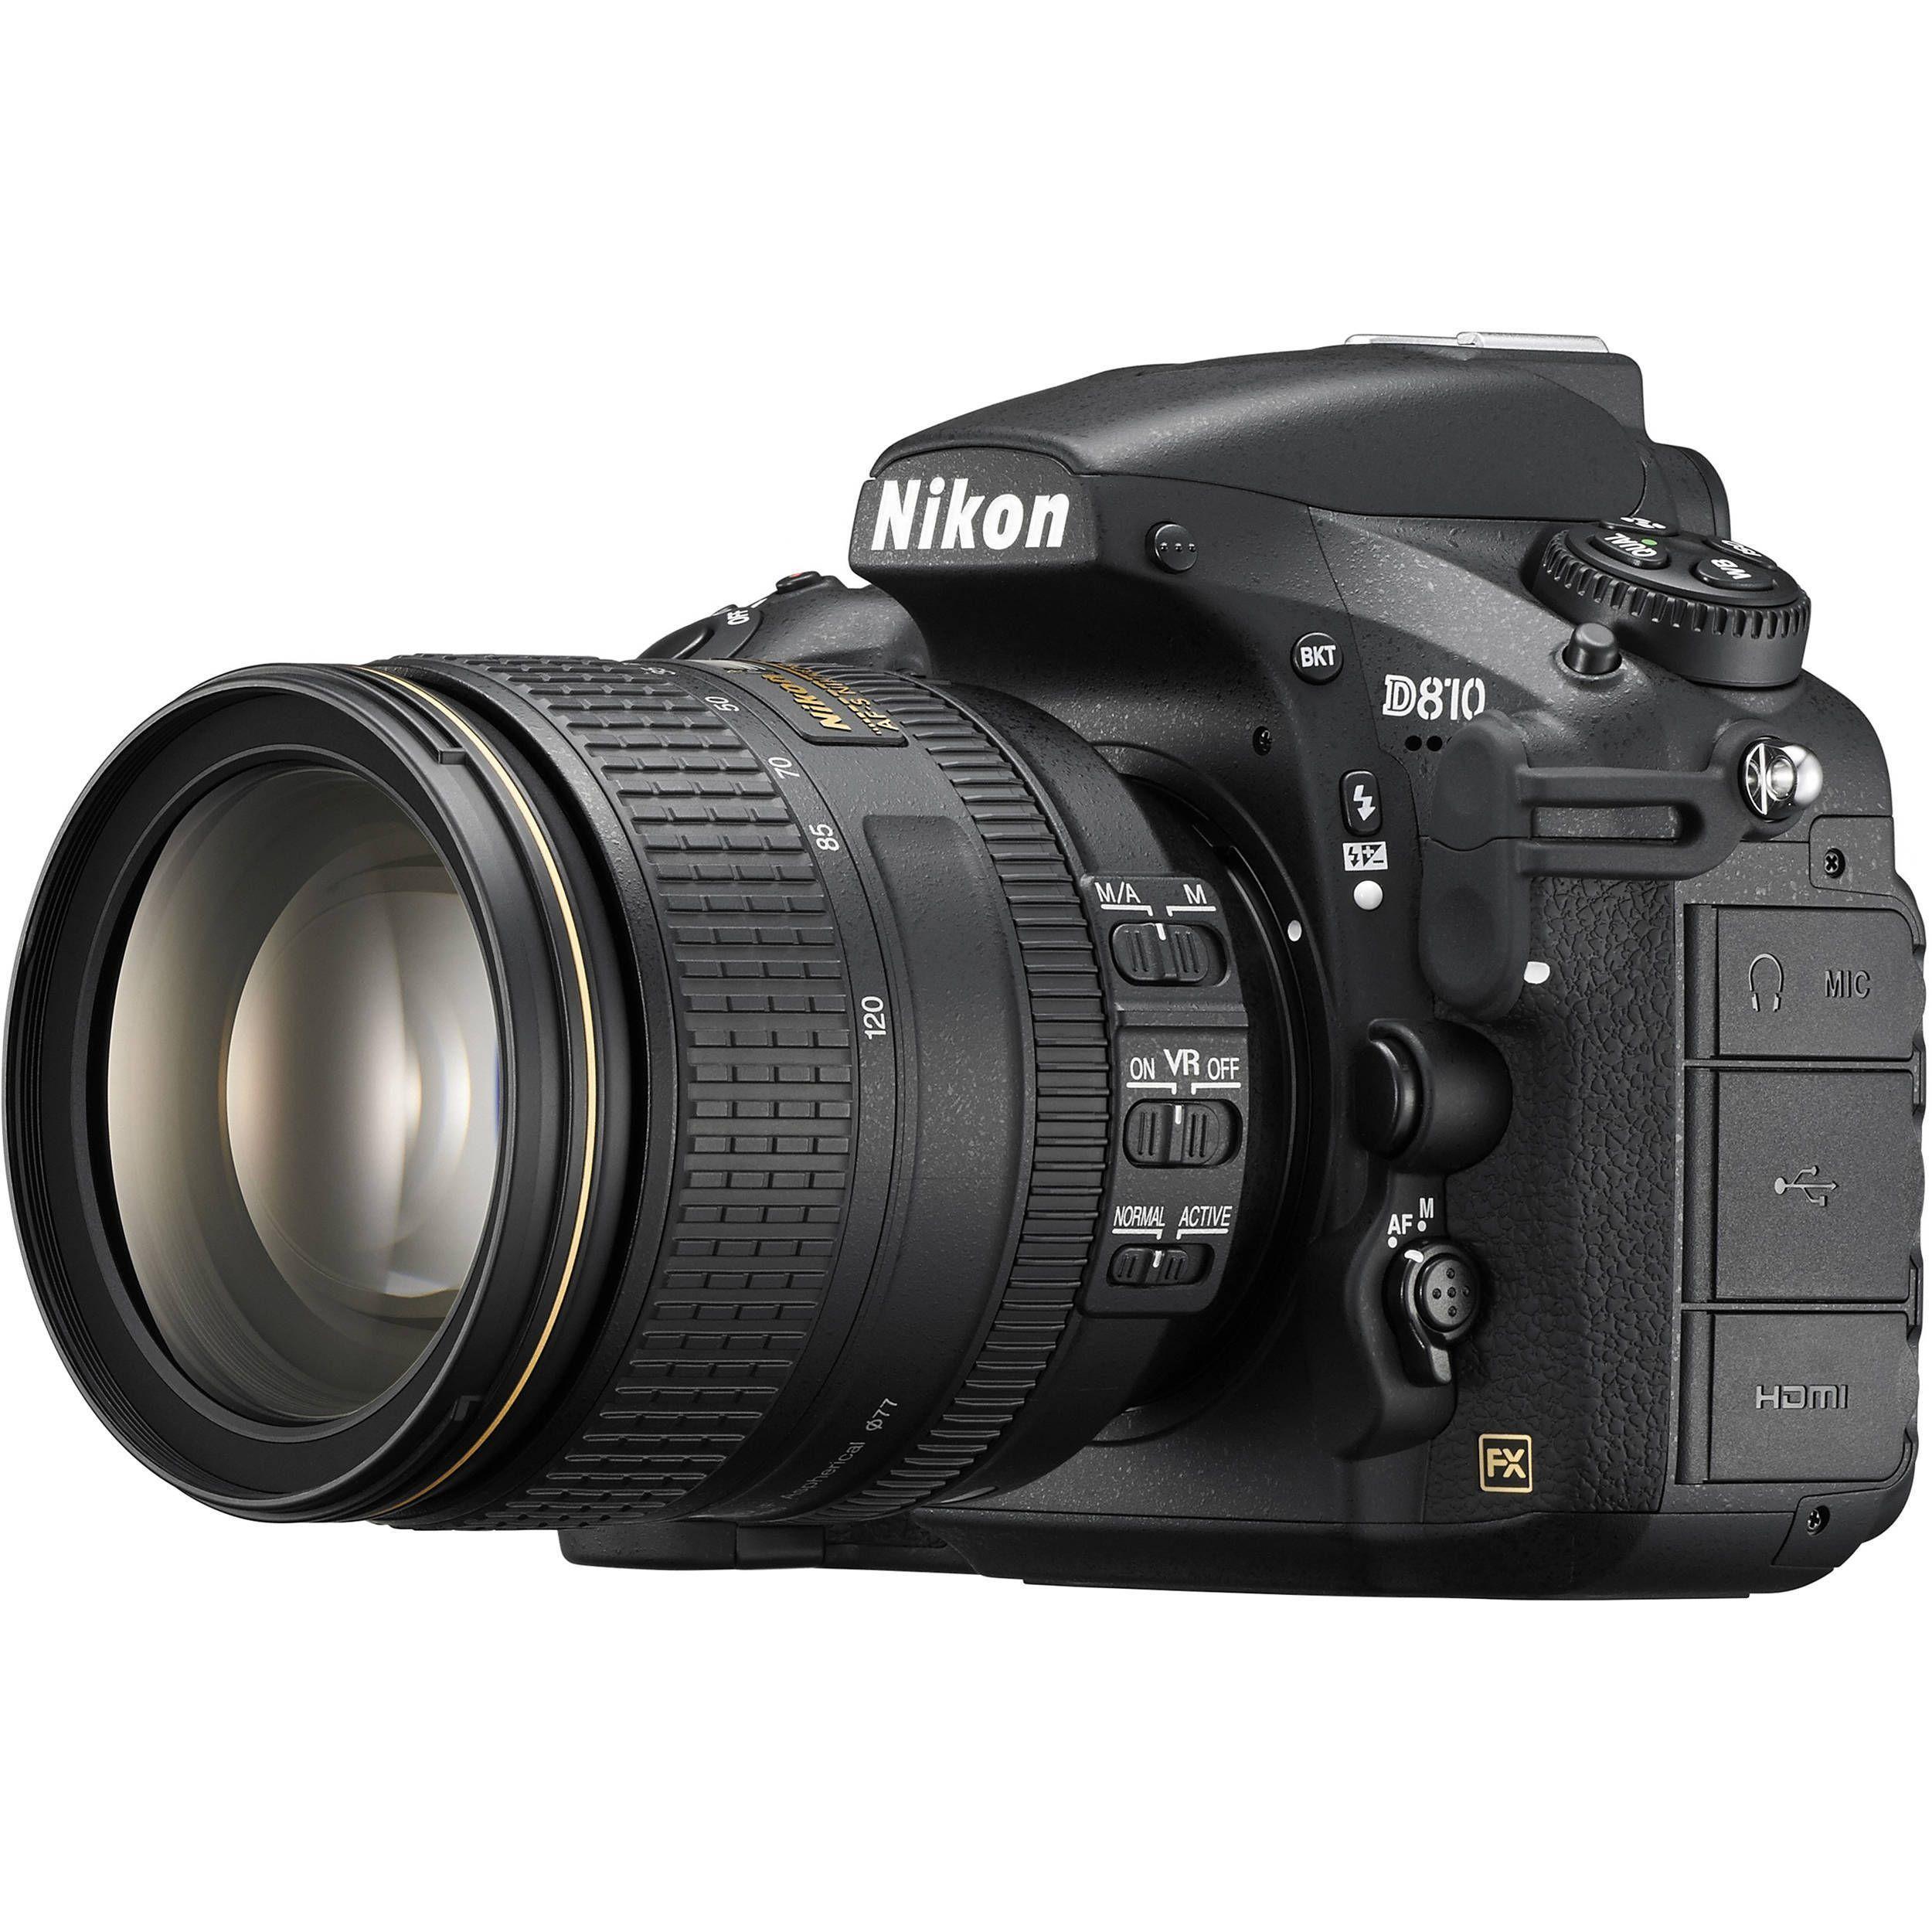 Nikon D810 Dslr Camera With 24 120mm Lens Nikondigitalcameras Canon Camera Models Nikon Dslr Camera